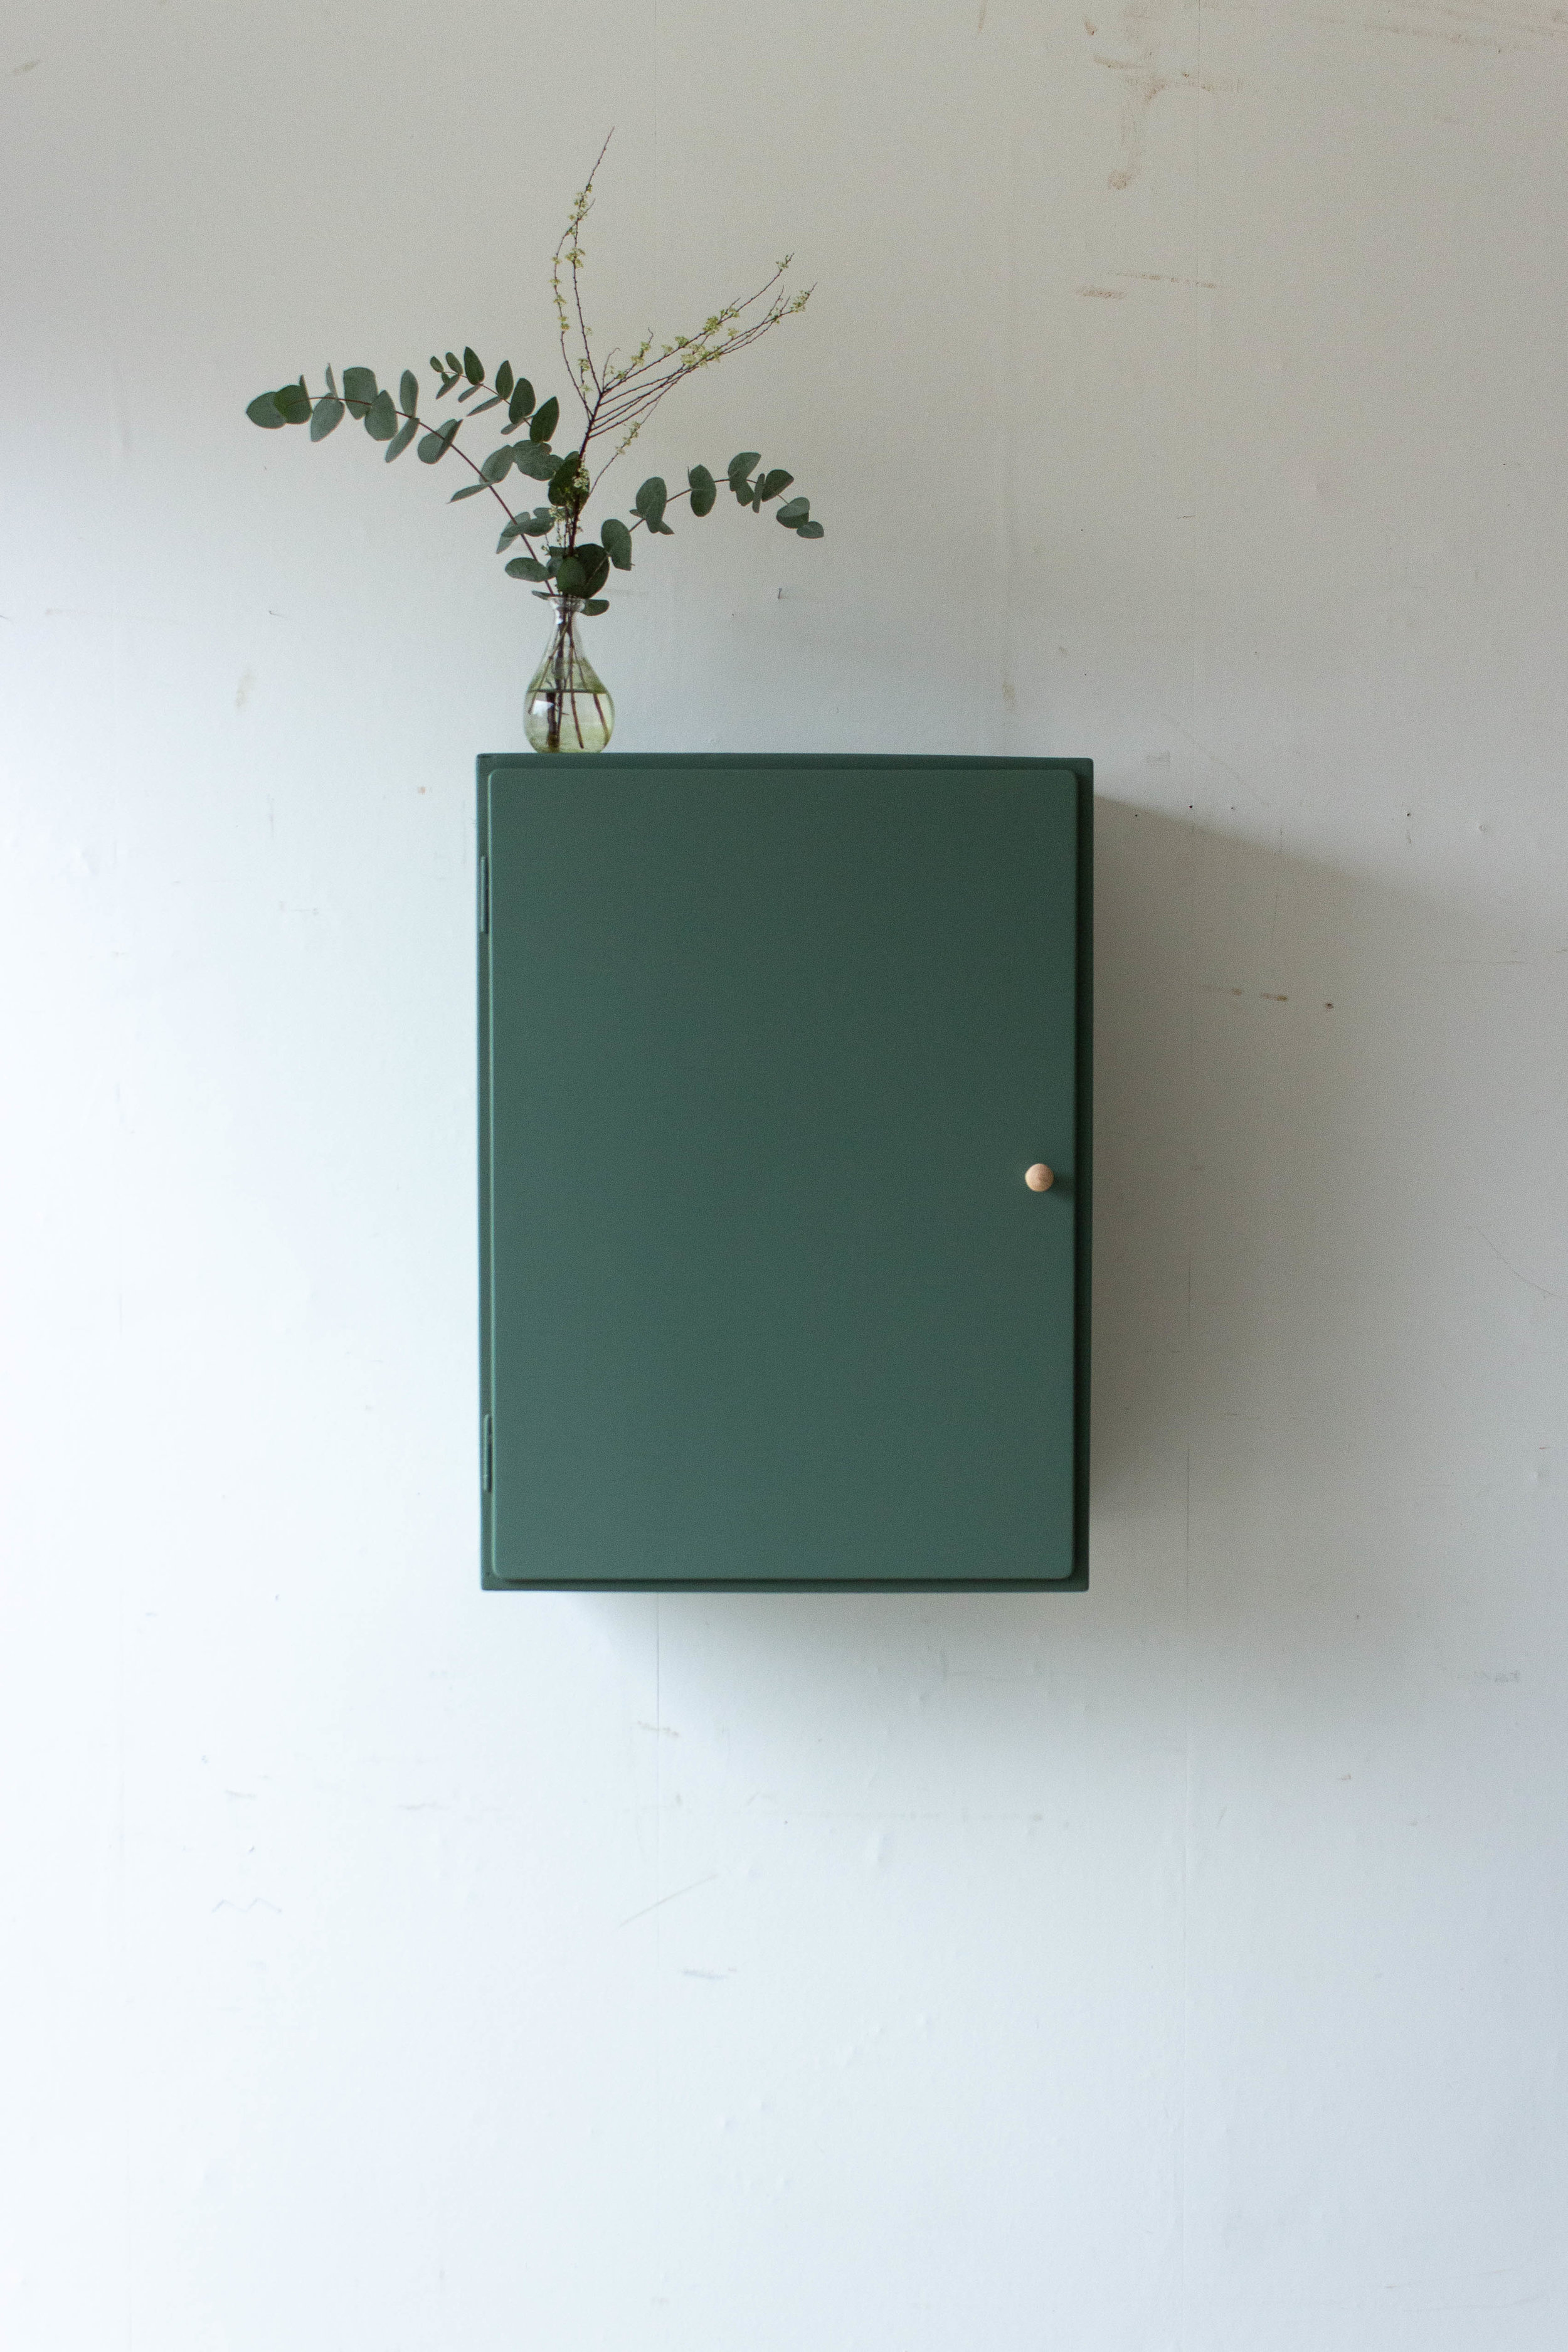 6035 - Dennengroen wadkastje met houten knop-5.jpg